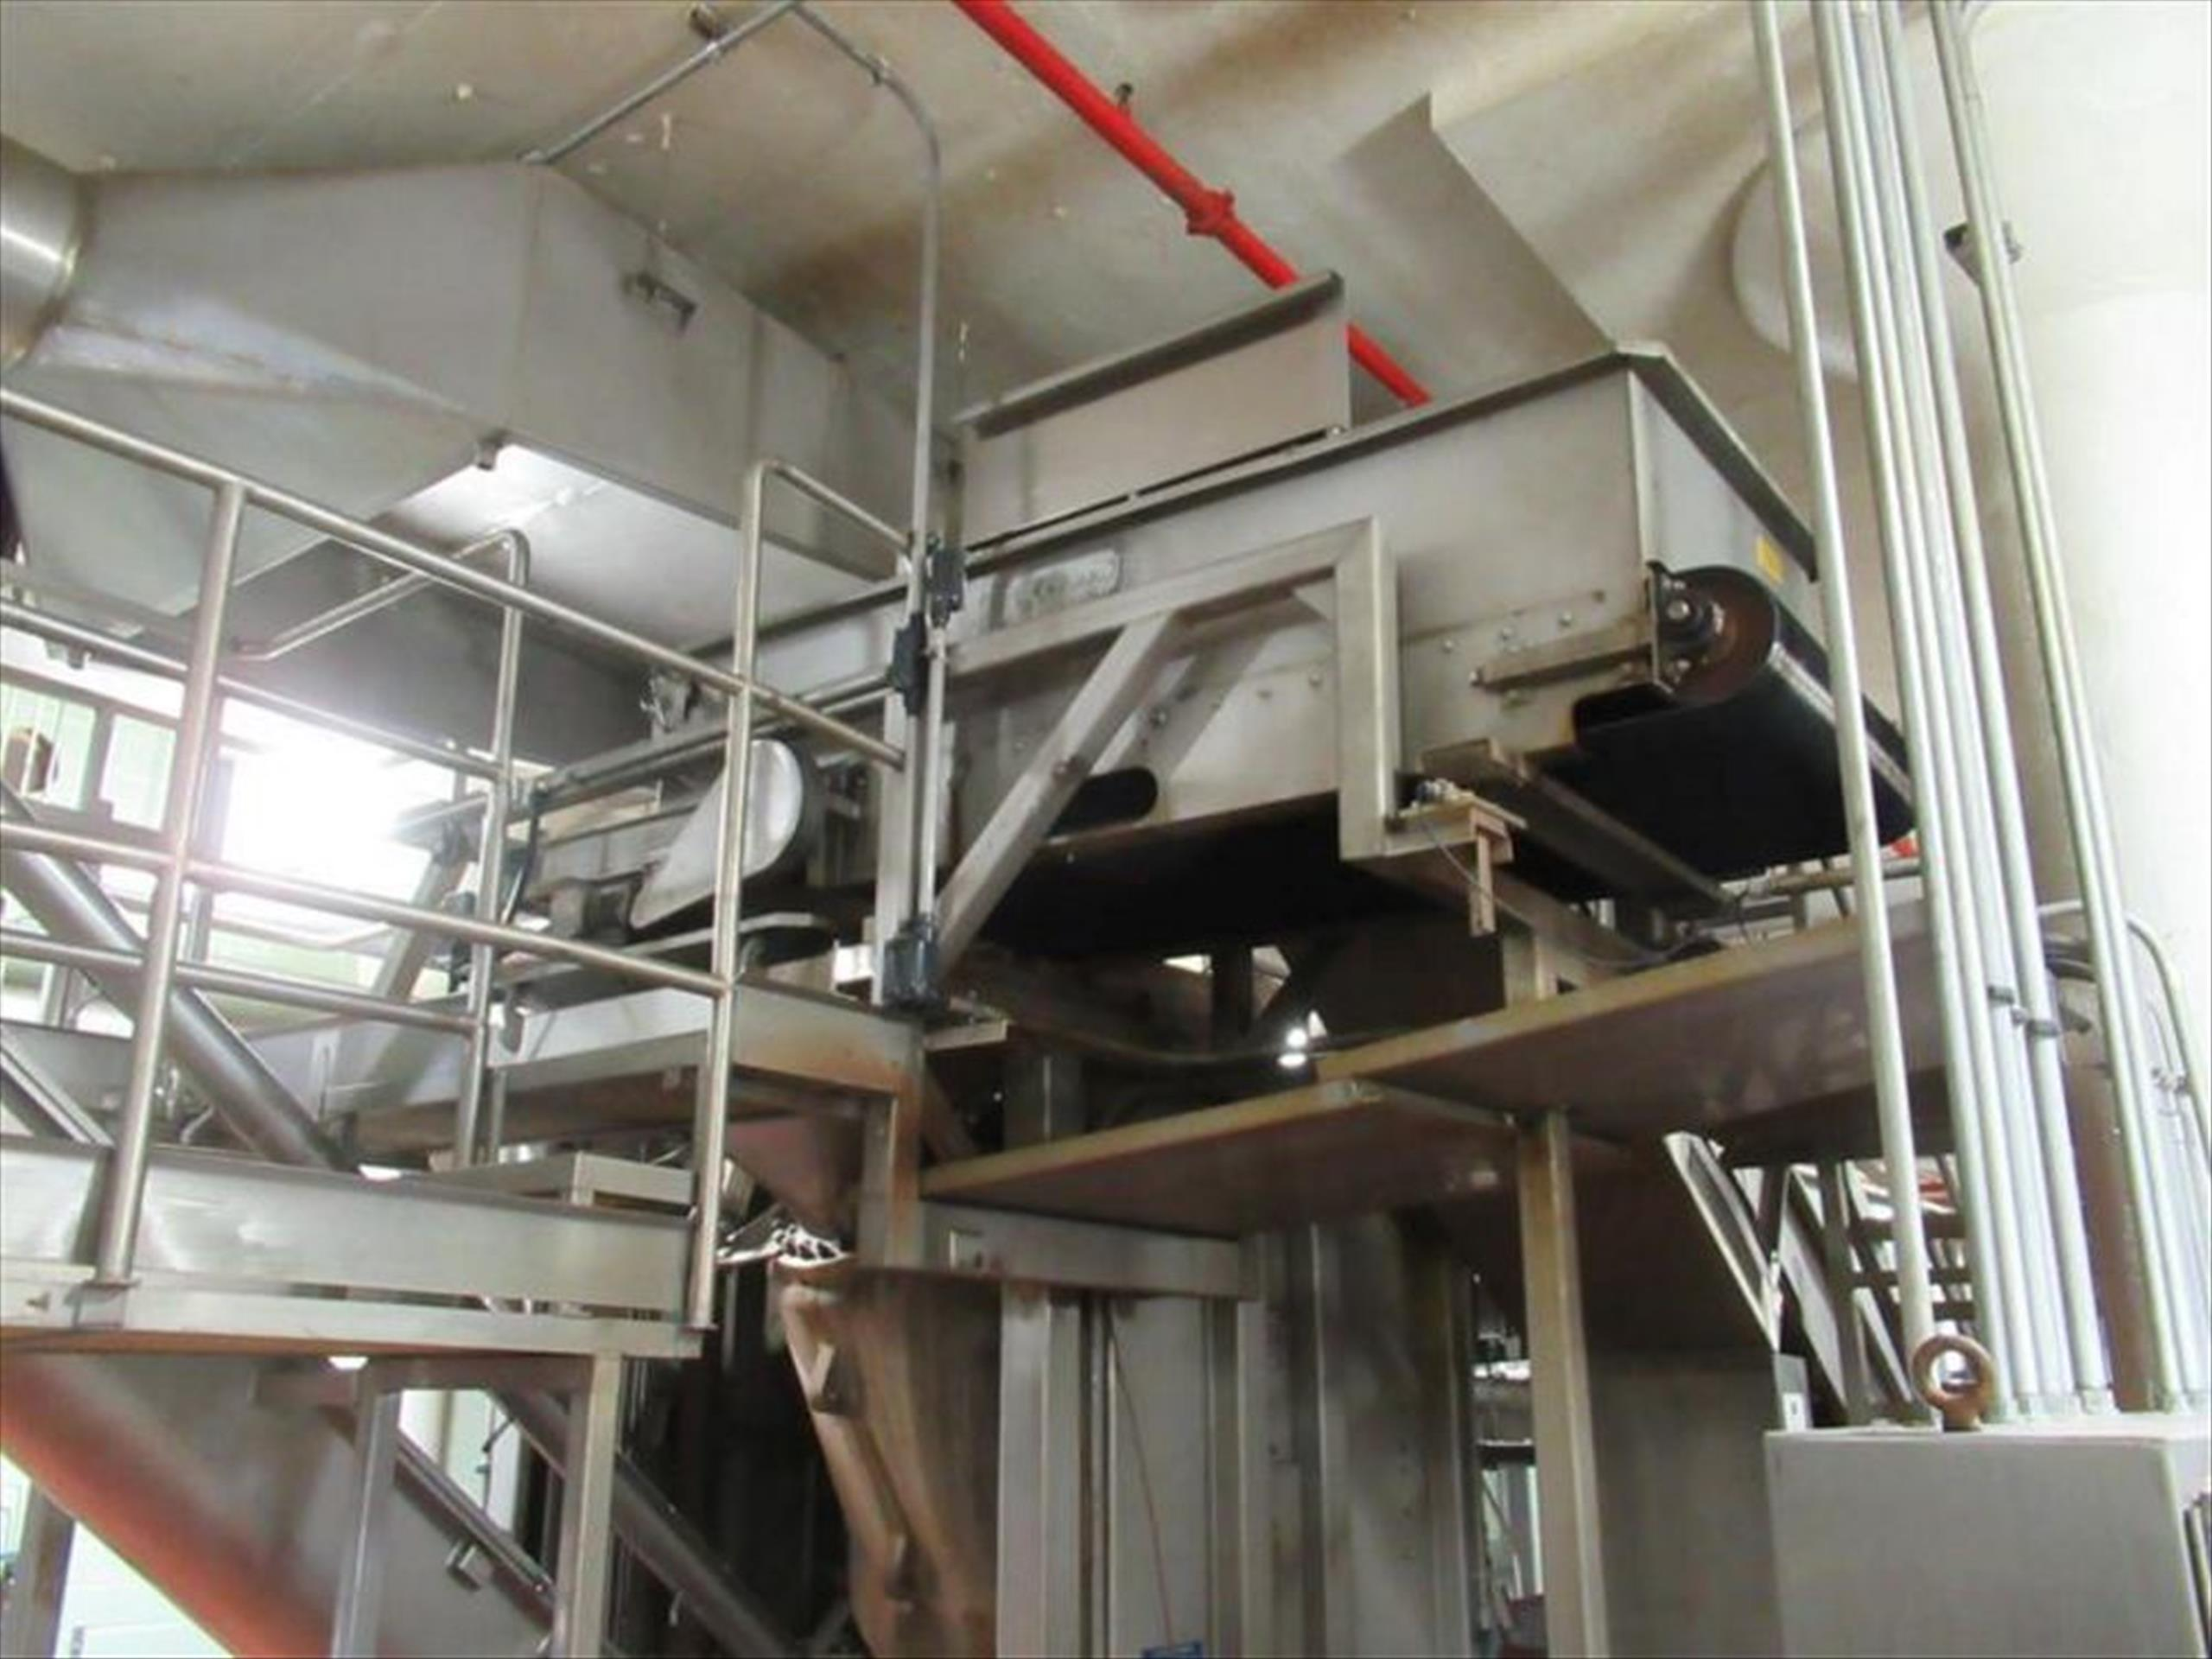 Starr Weigh table conveyor 3 ft w x 6 ft l x 2 ft h, with rubber v-belt, Flintec -SB145KLB-CUC3 load